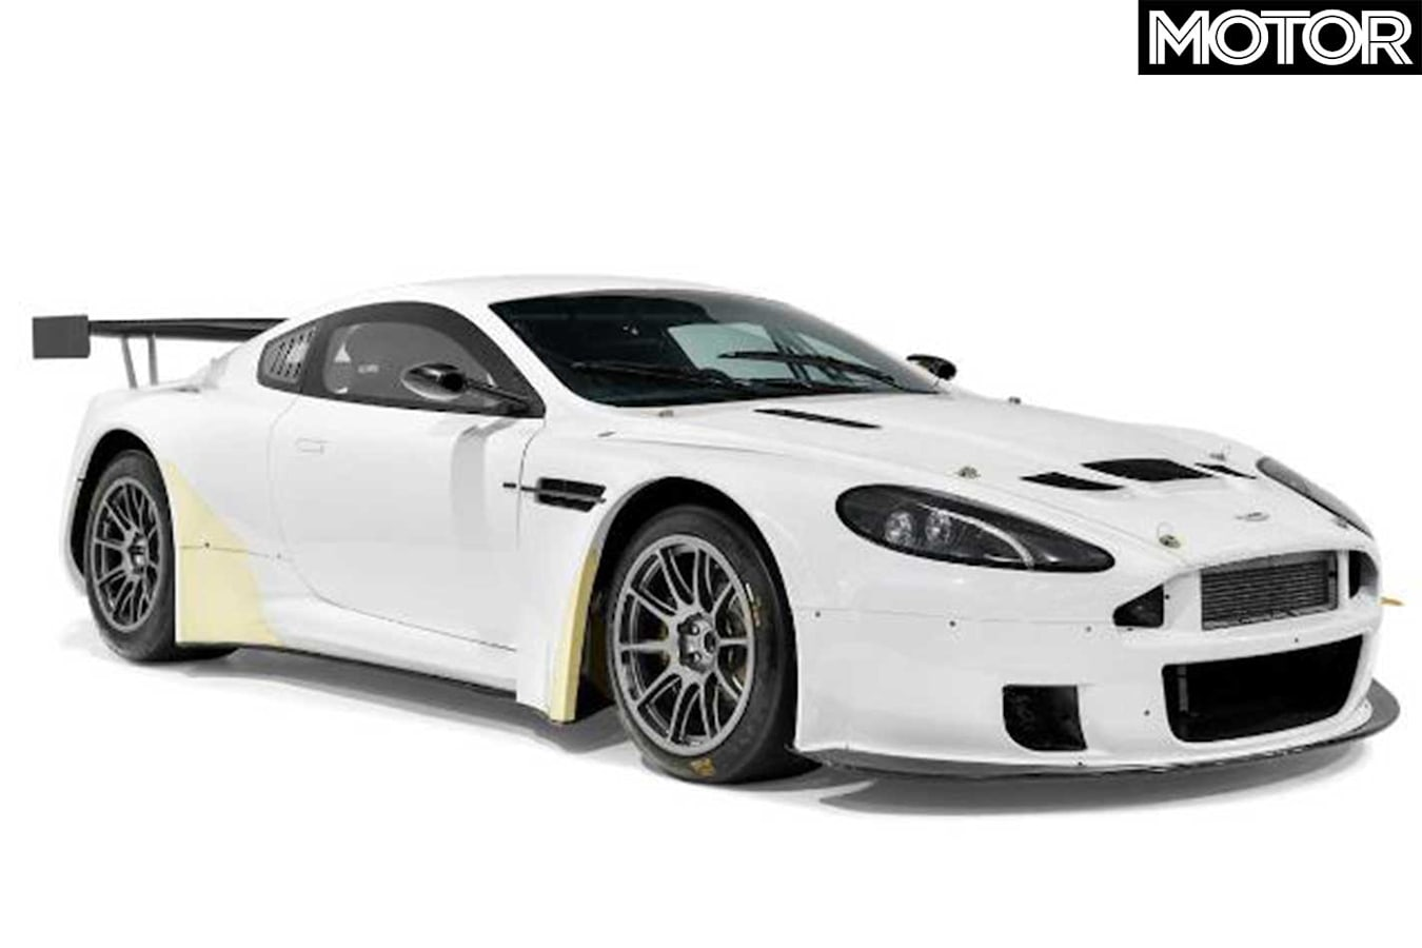 Gosford Classic Cars Auction Aston Martin DBRS 9 Front Jpg